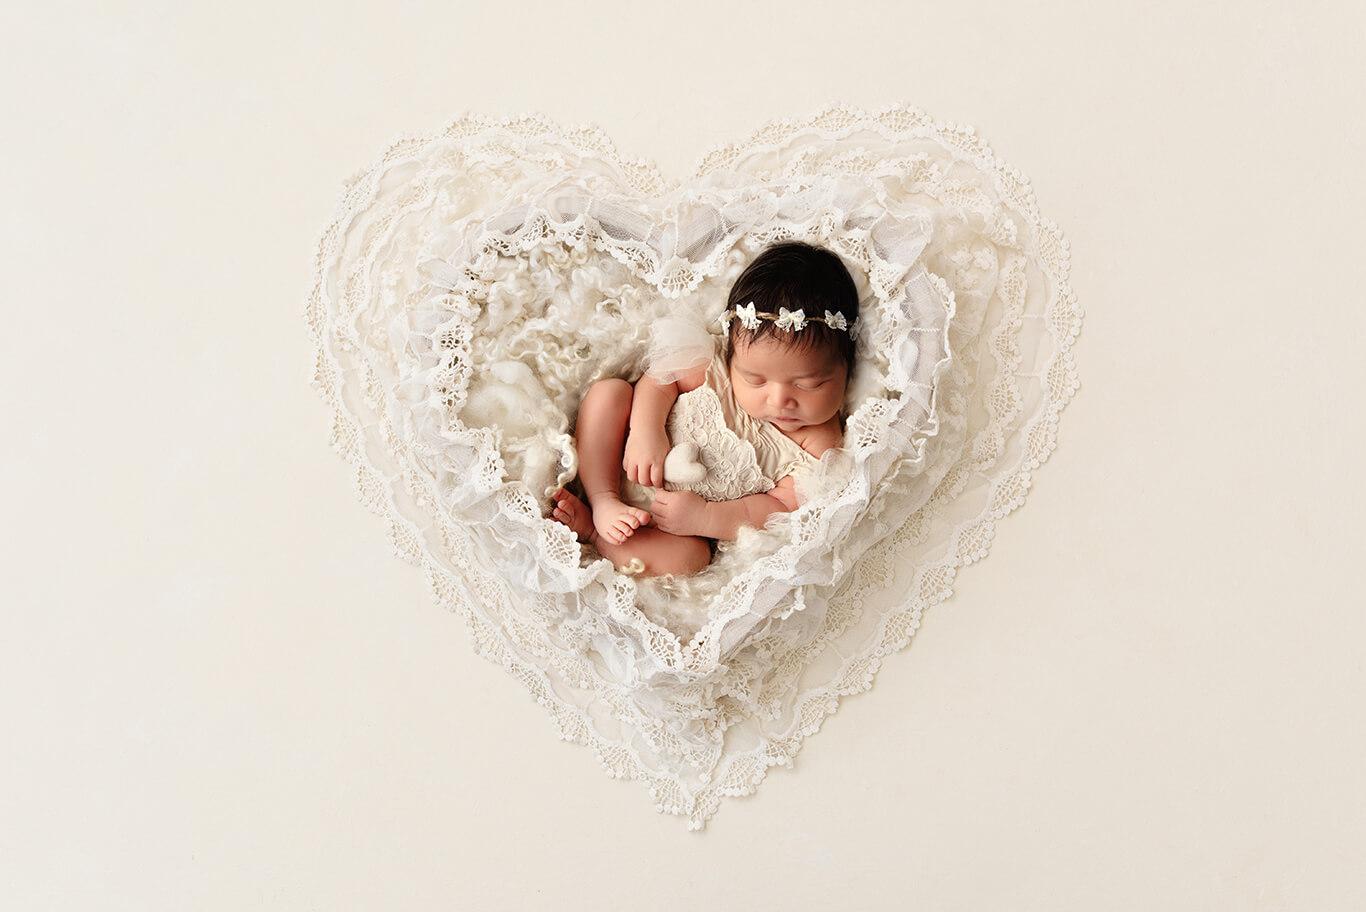 angelic newborn photography in studio